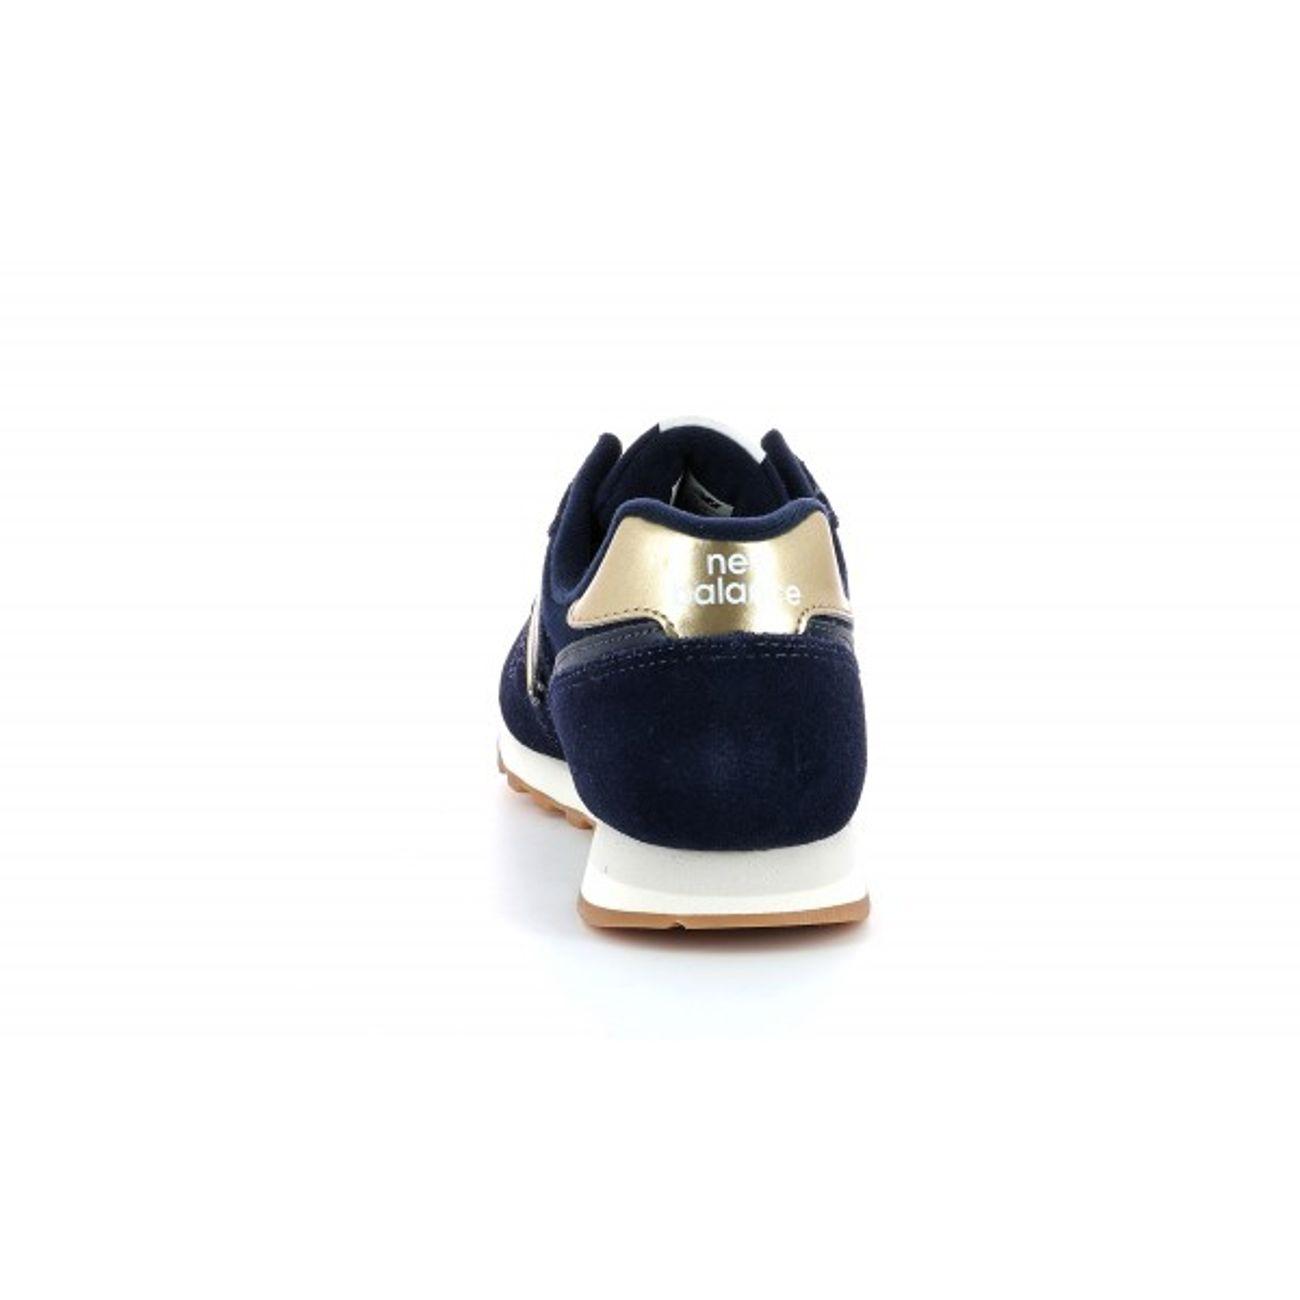 Mode- Lifestyle femme NEW BALANCE Baskets Bleu Femme New Balance Classics 373